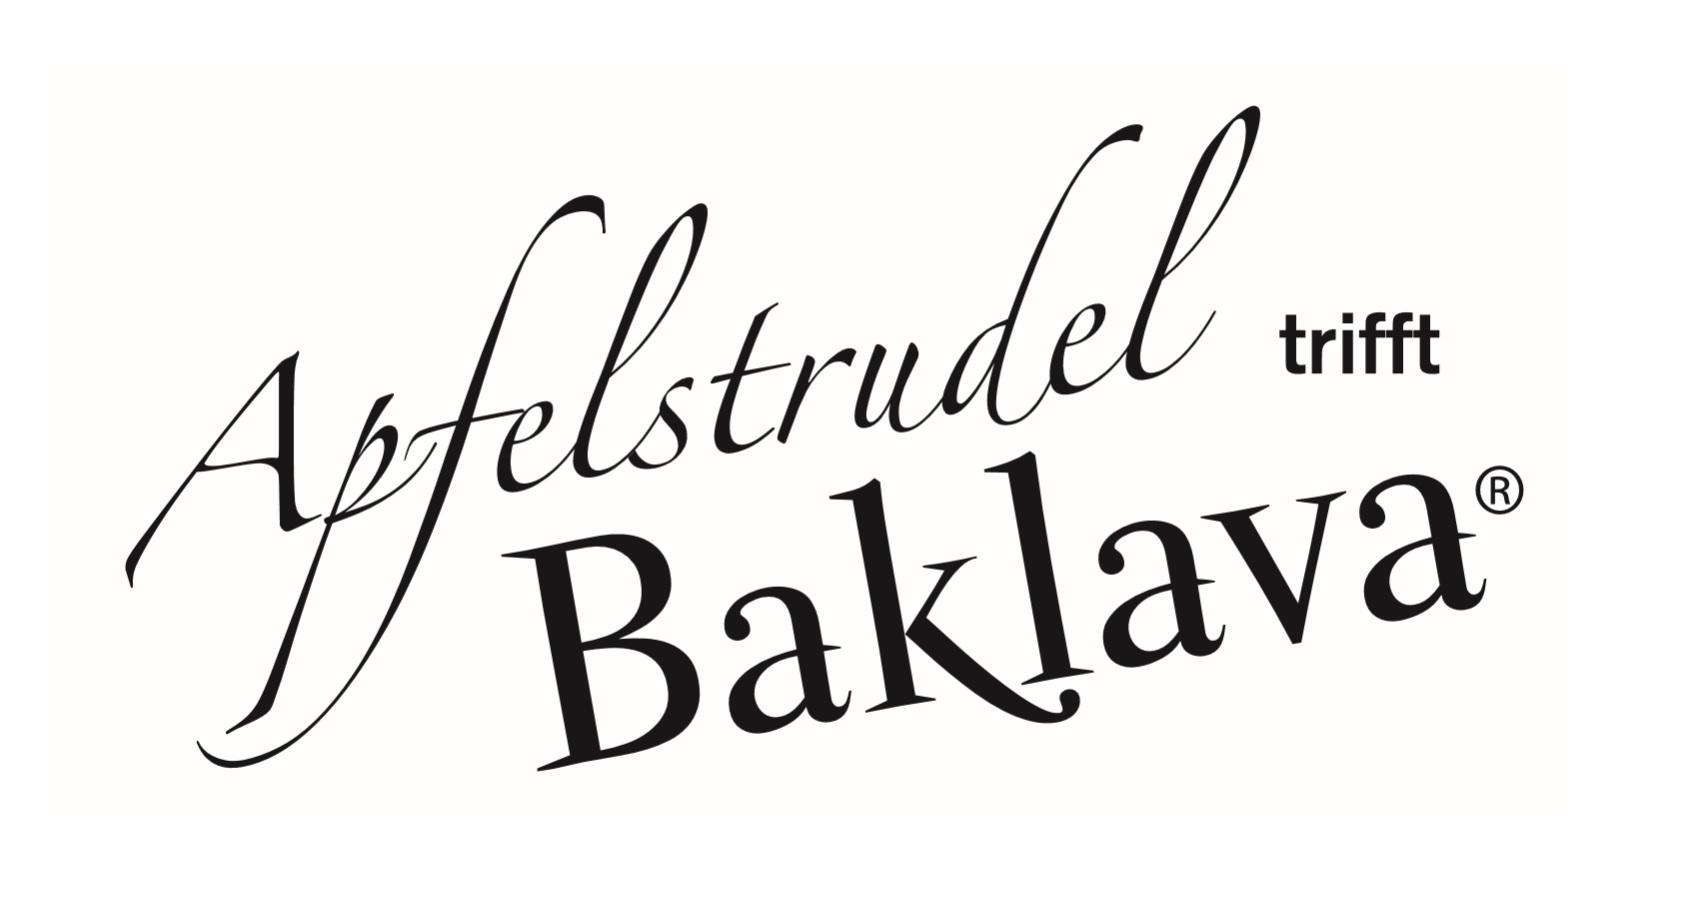 Apfelstrudel trifft Baklava